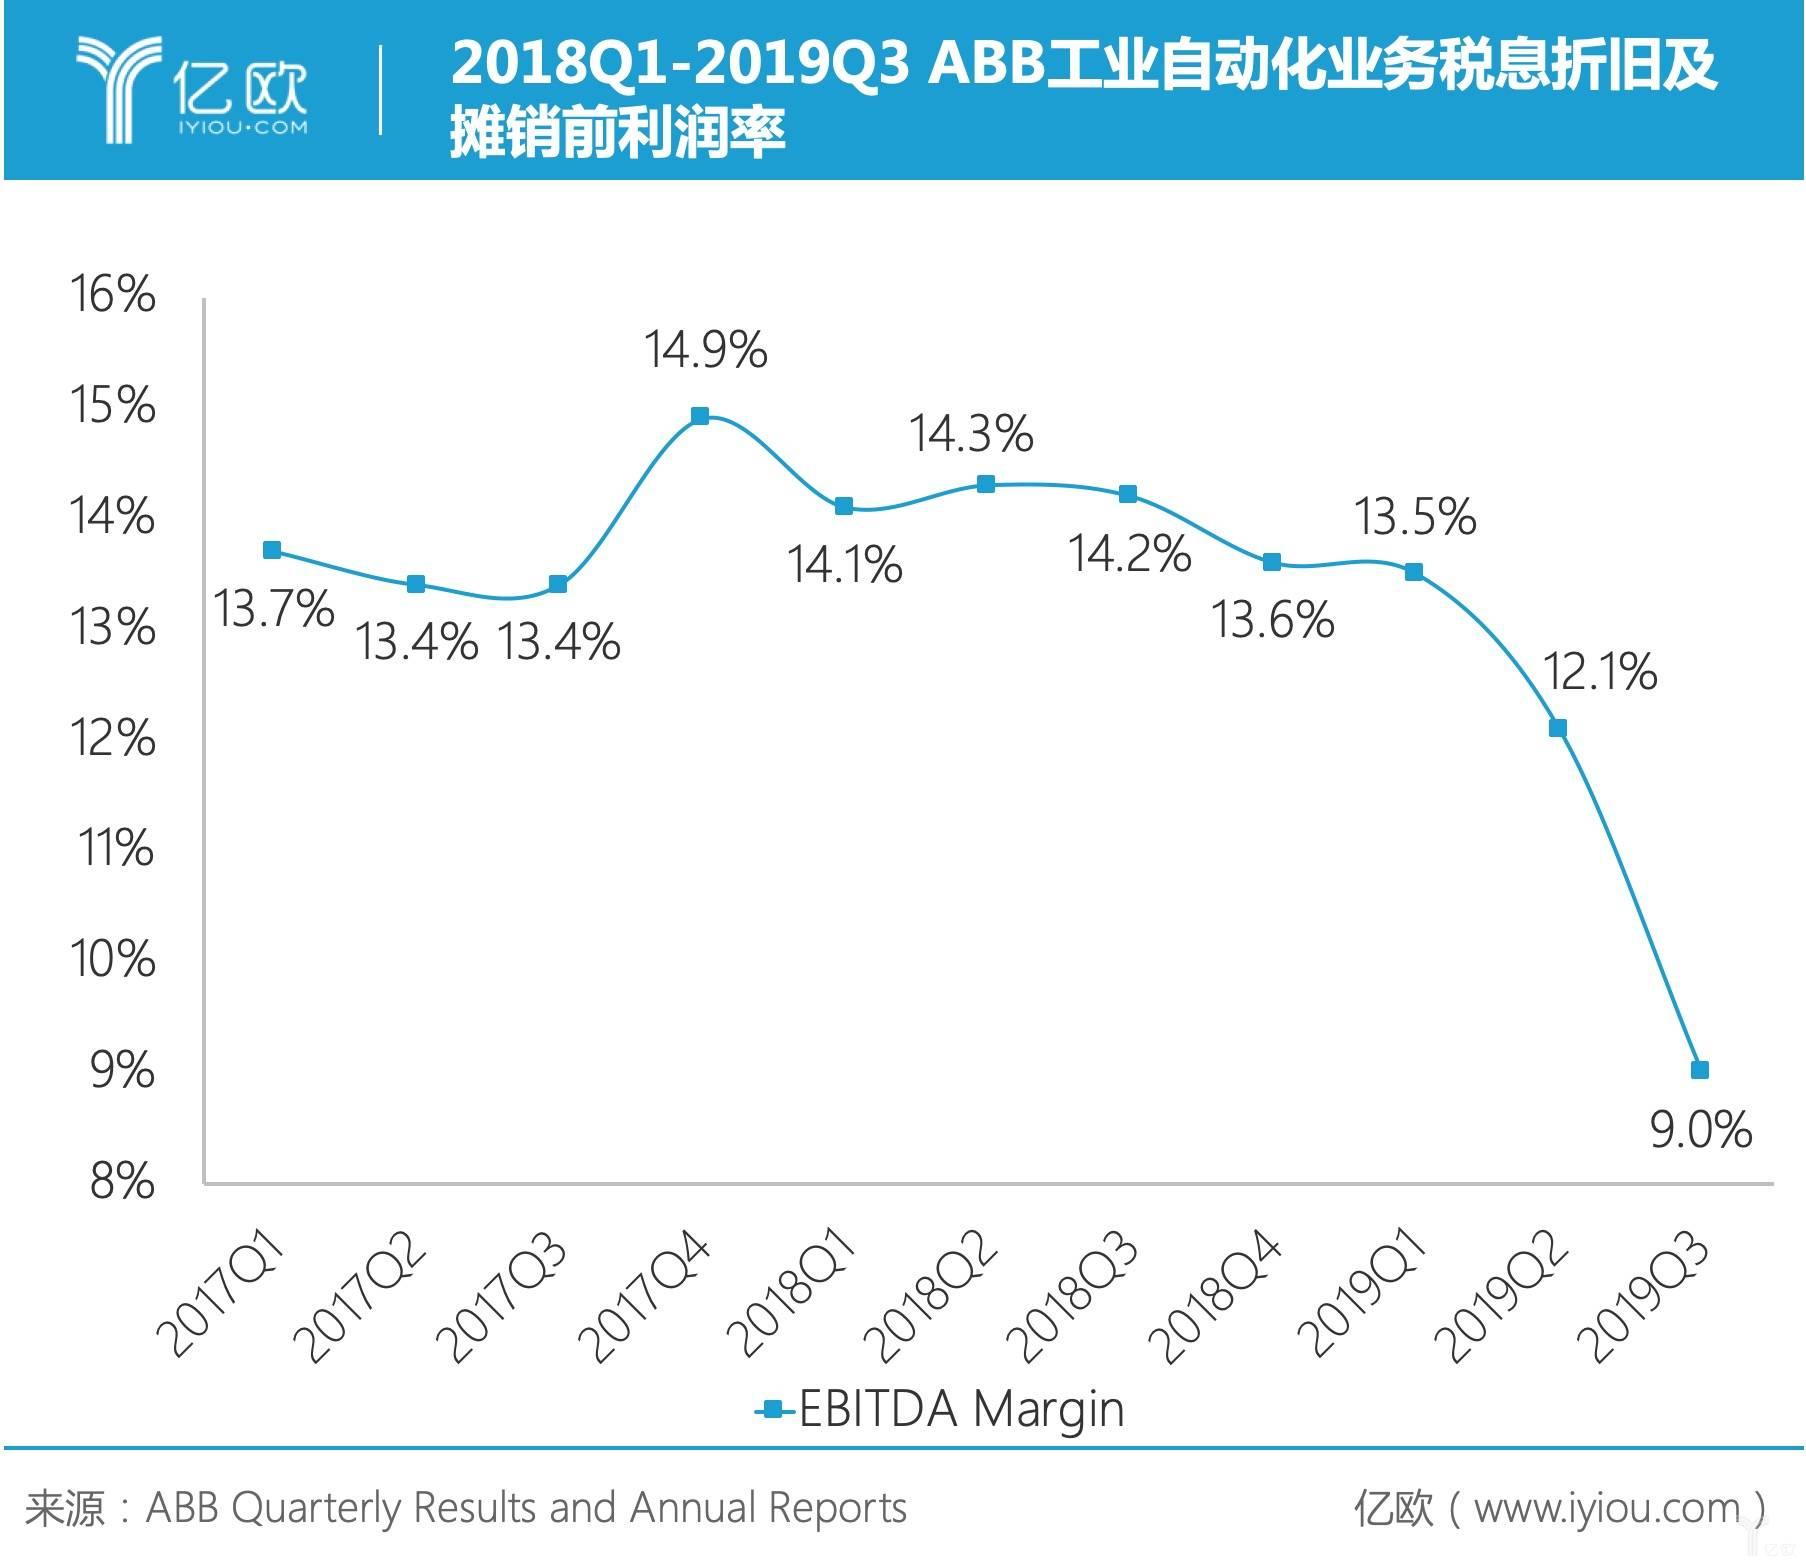 2018Q1-2019Q3 ABB工业自动化业务税息折旧及摊销前利润率